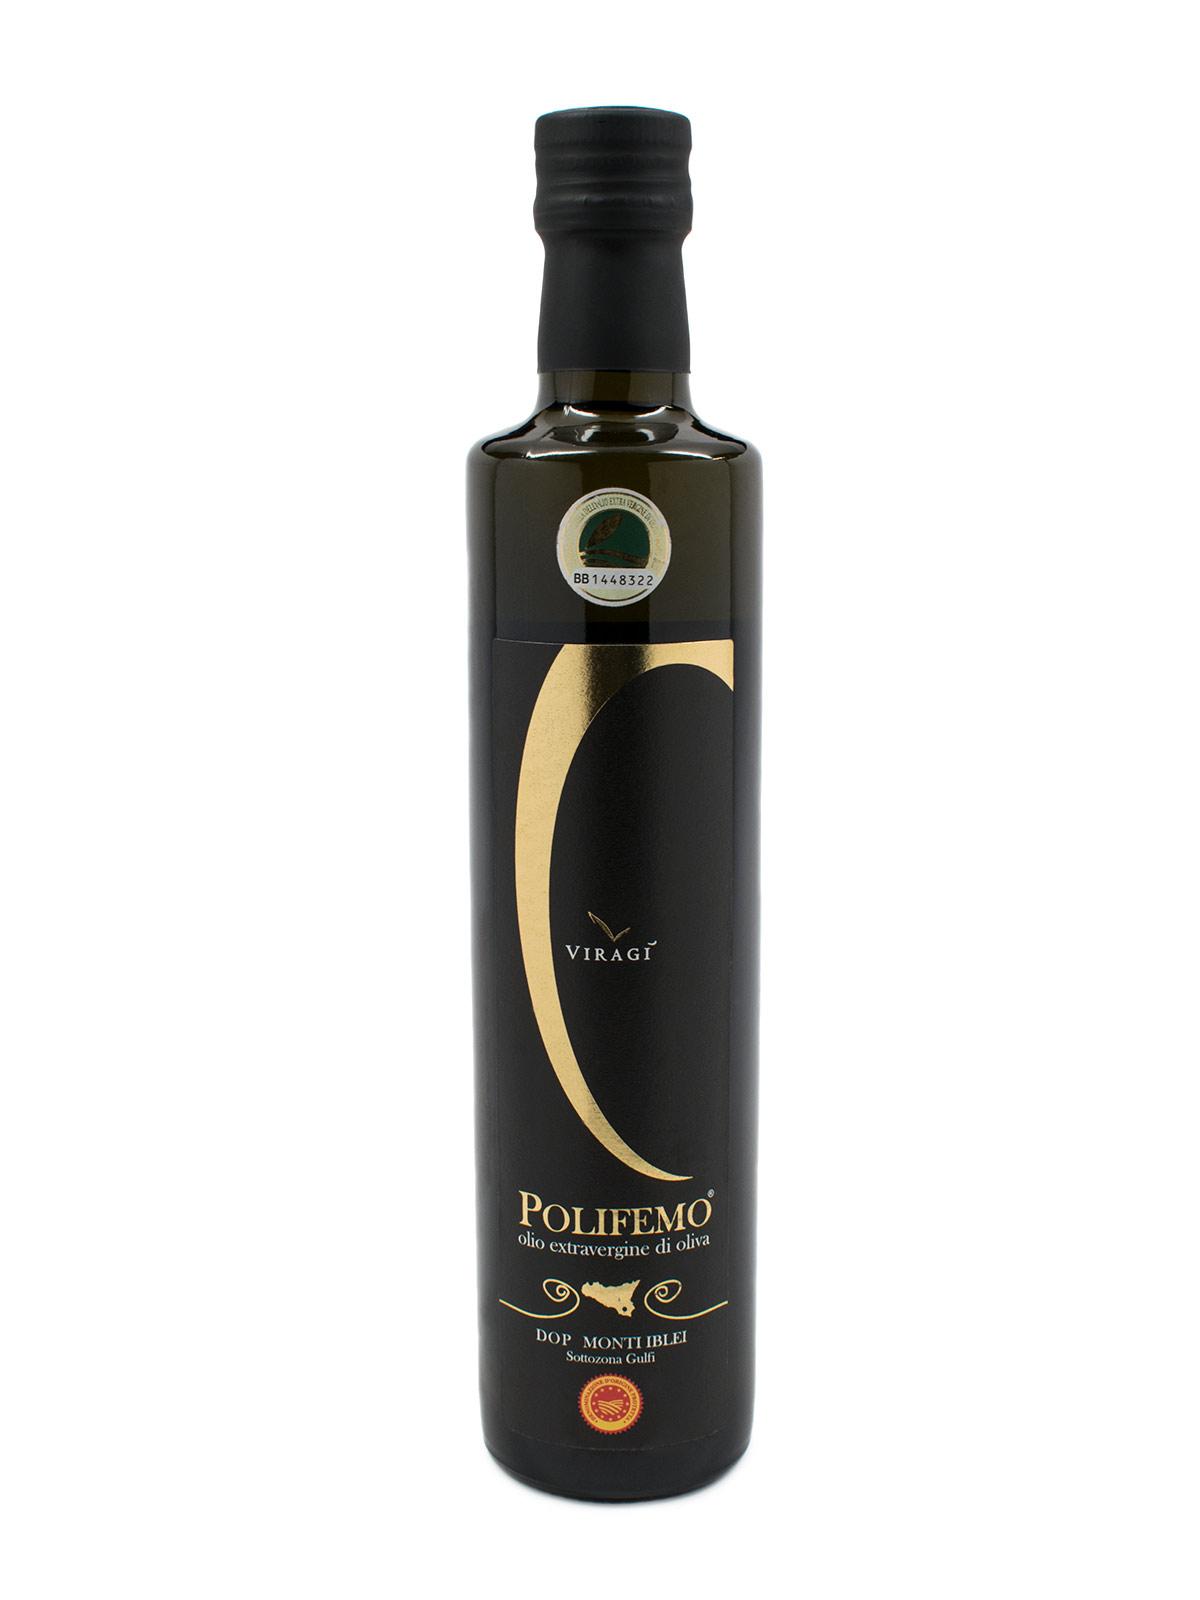 Polifemo Extra Virgin Olive Oil D.O.P. - Oils & Vinegars - Buon'Italia